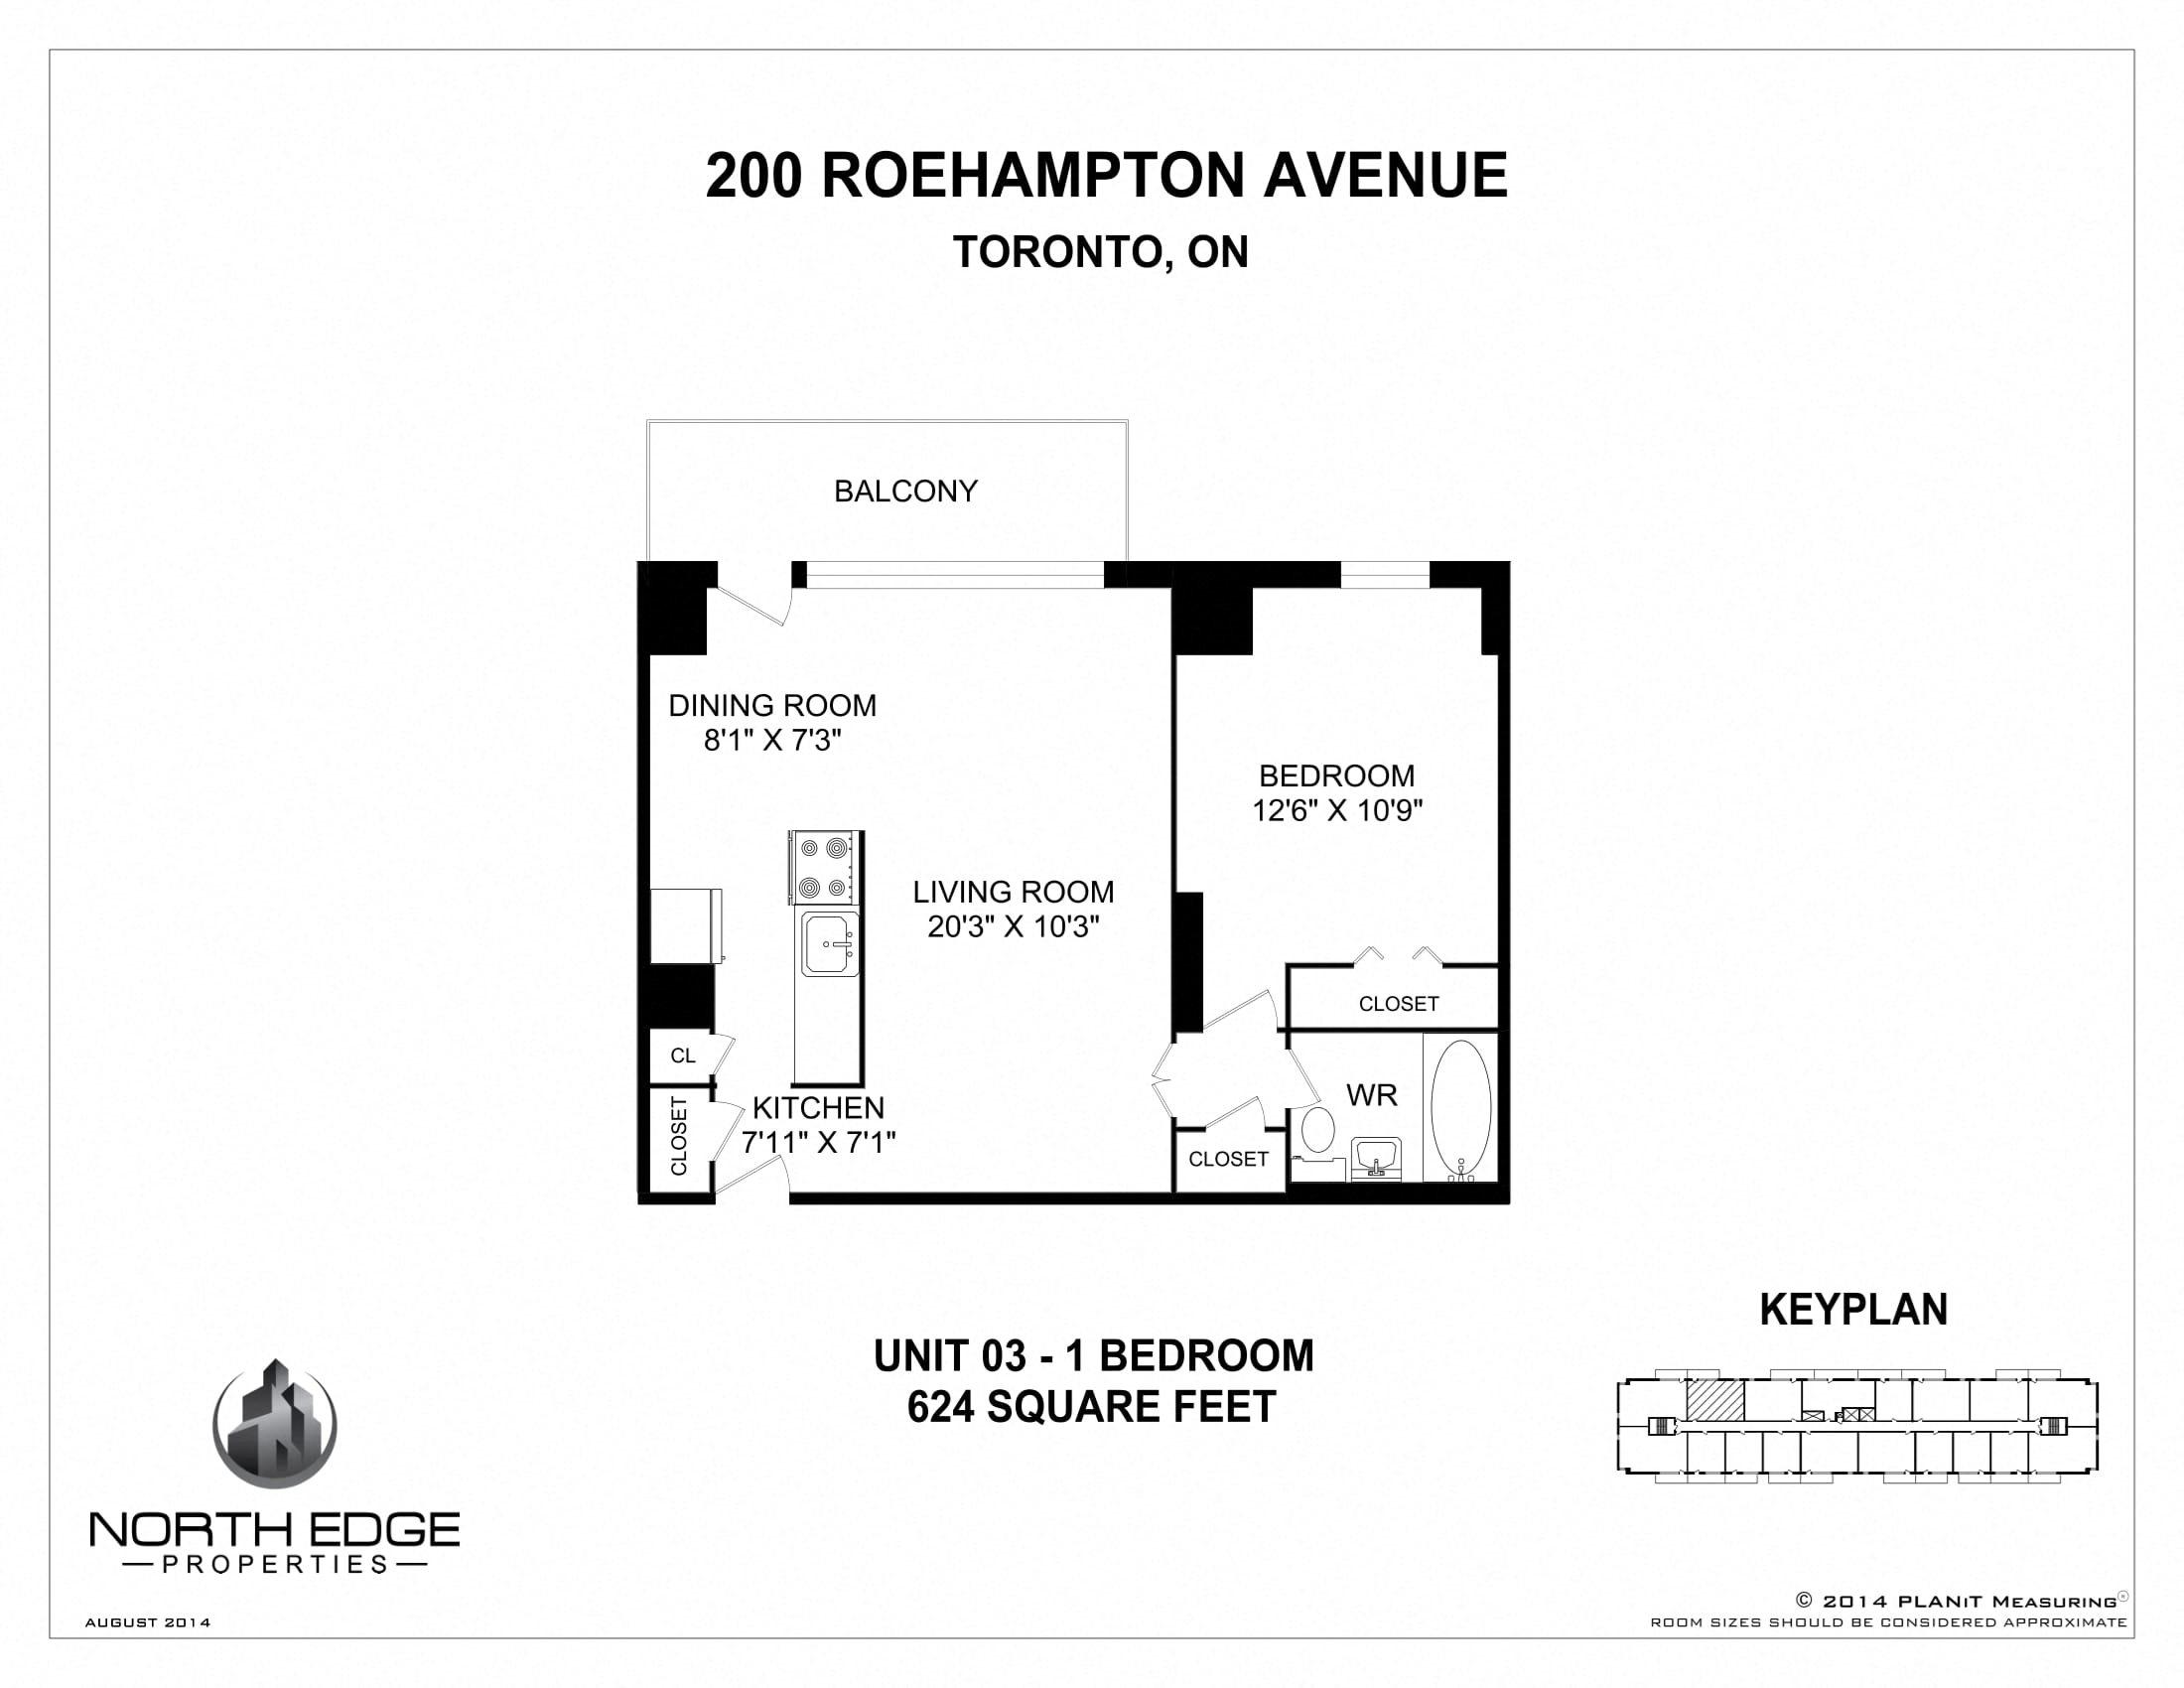 floor plans of 200 roehampton in toronto on